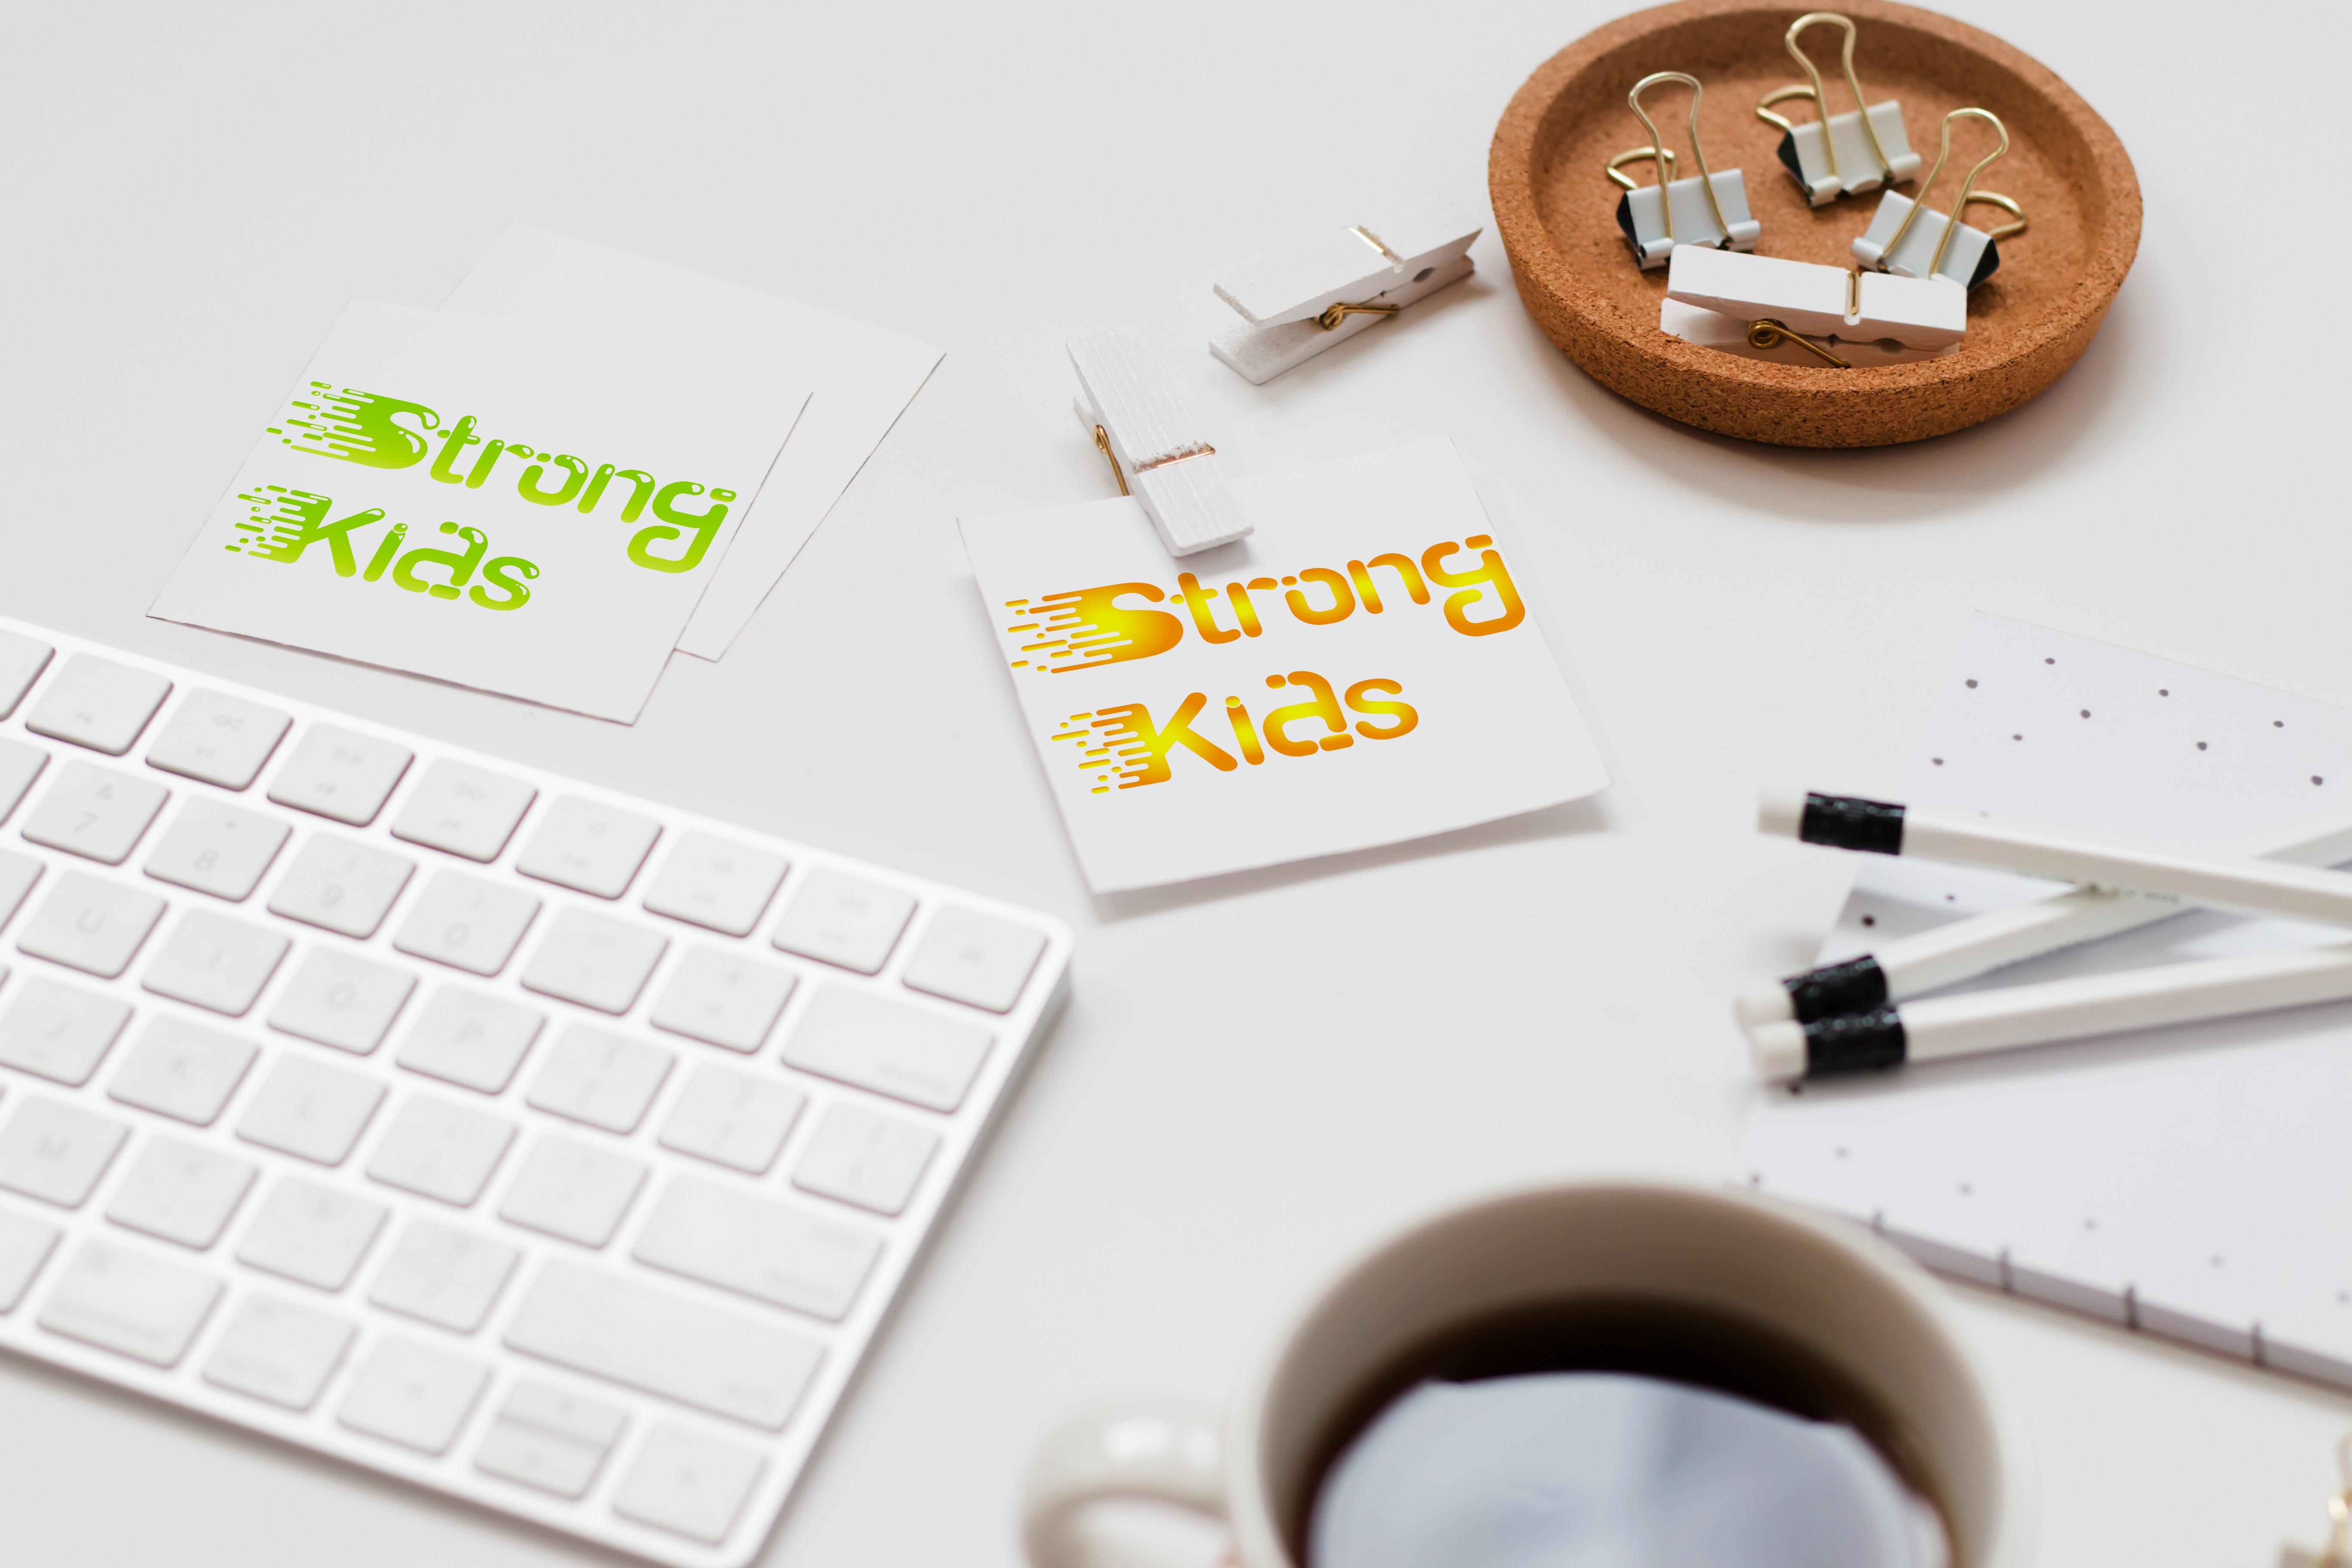 Логотип для Детского Интернет Магазина StrongKids фото f_6155c710f8dc40f4.jpg